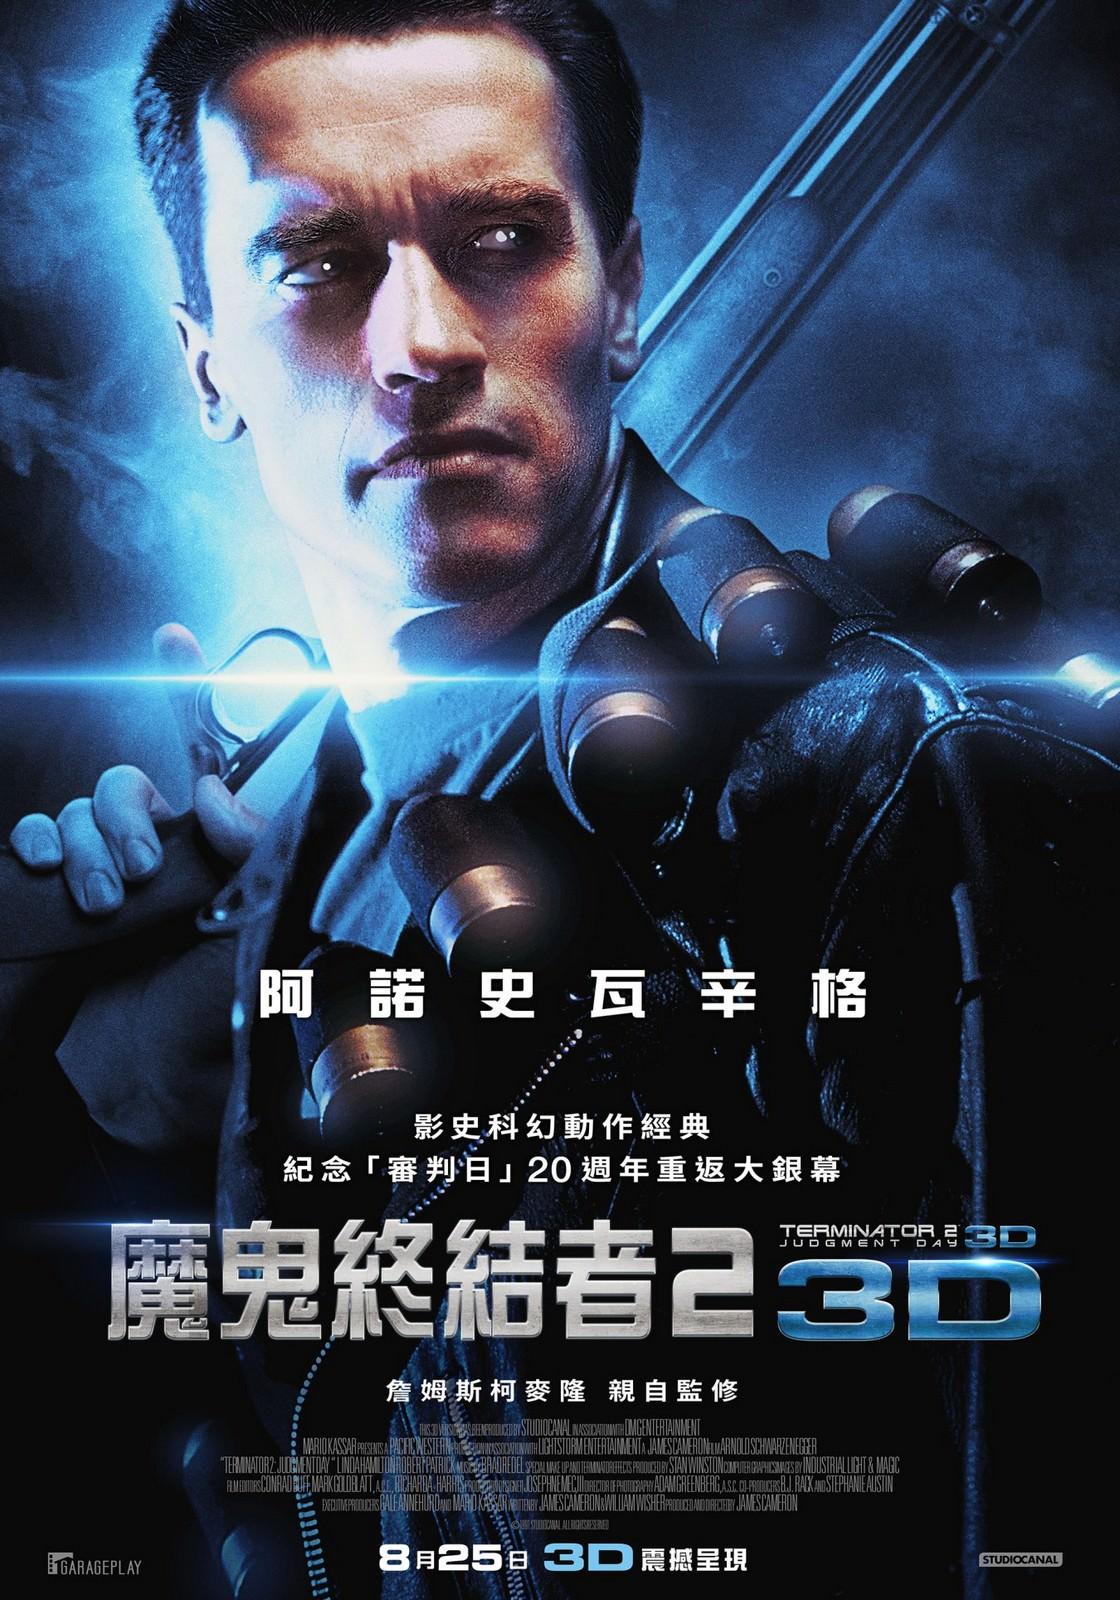 Movie, Terminator 2: Judgment Day(美國, 1991年) / 魔鬼終結者2(台灣) / 终结者2:审判日(中國) / 未來戰士續集(香港), 電影海報, 台灣